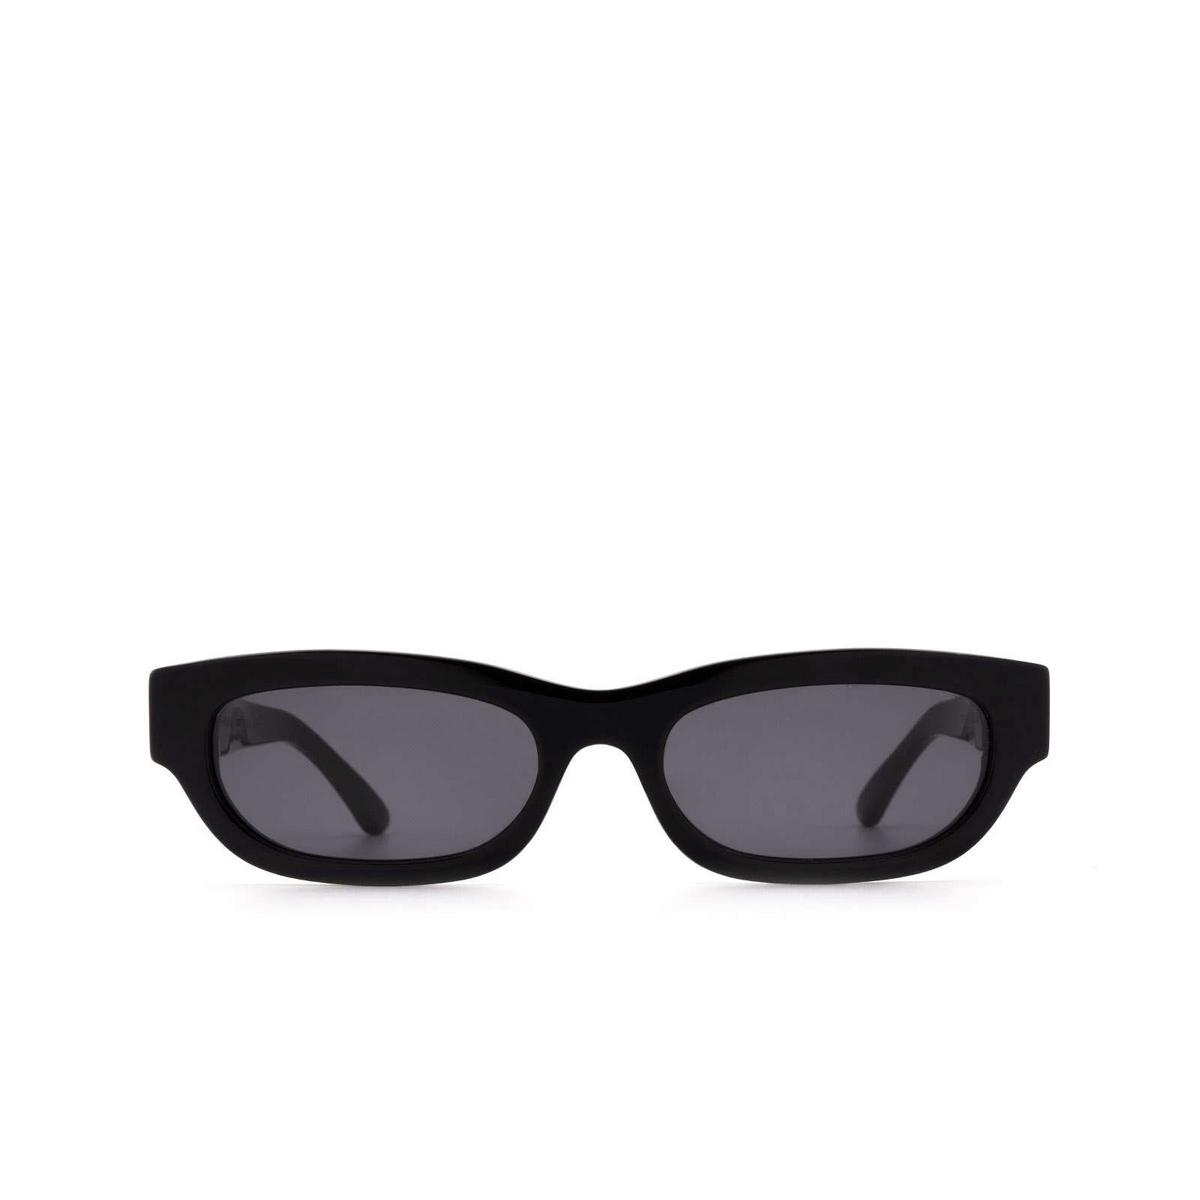 Huma® Rectangle Sunglasses: Tojo color Black 06 - front view.